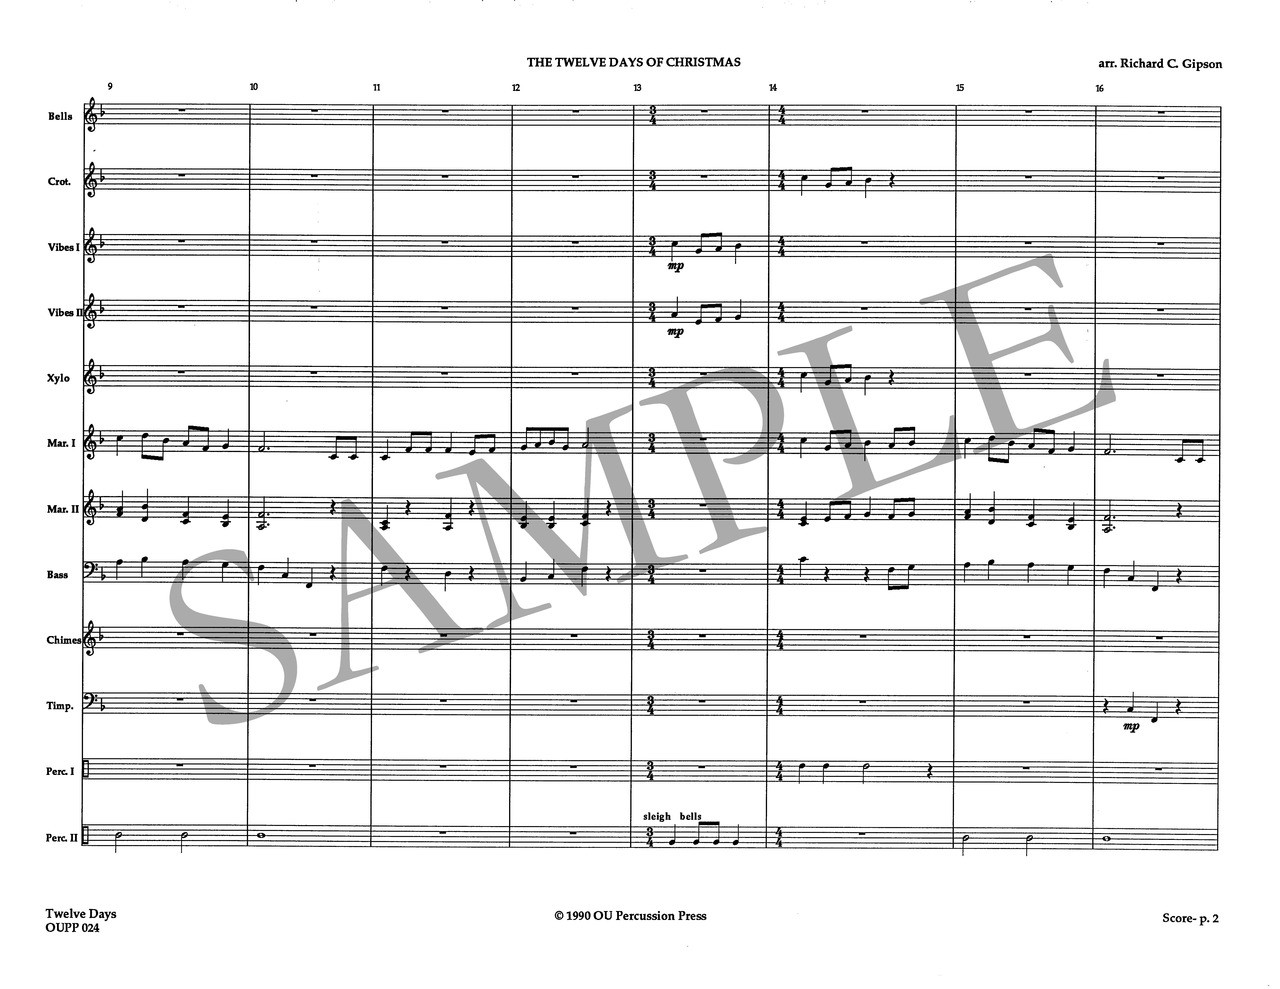 Twelve Days Of Christmas Sheet Music.Twelve Days Of Christmas The